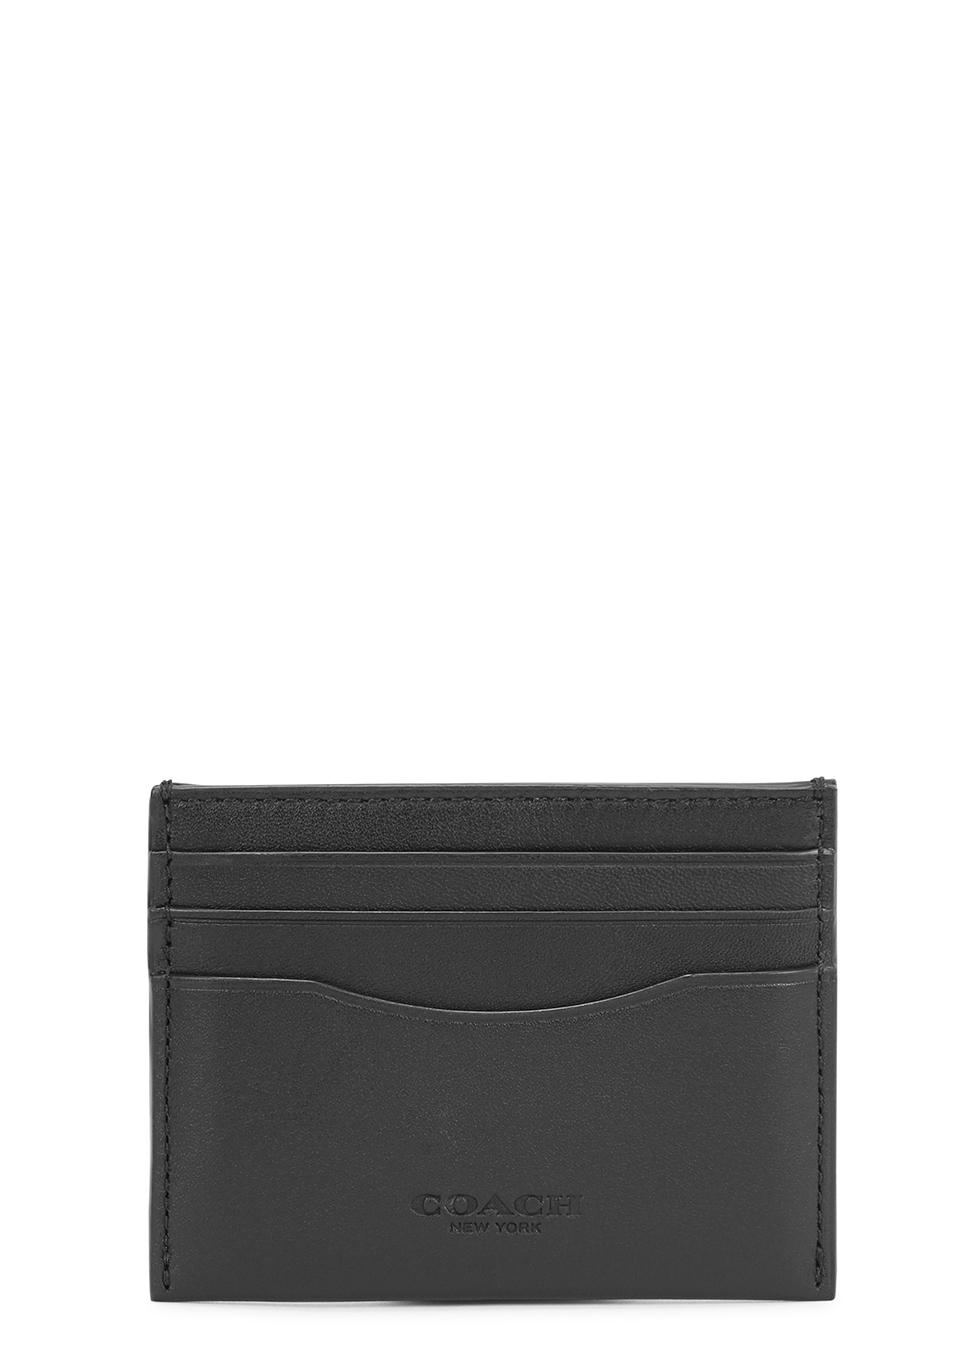 a4bbf407290 Women s Designer Purses and Wallets - Harvey Nichols